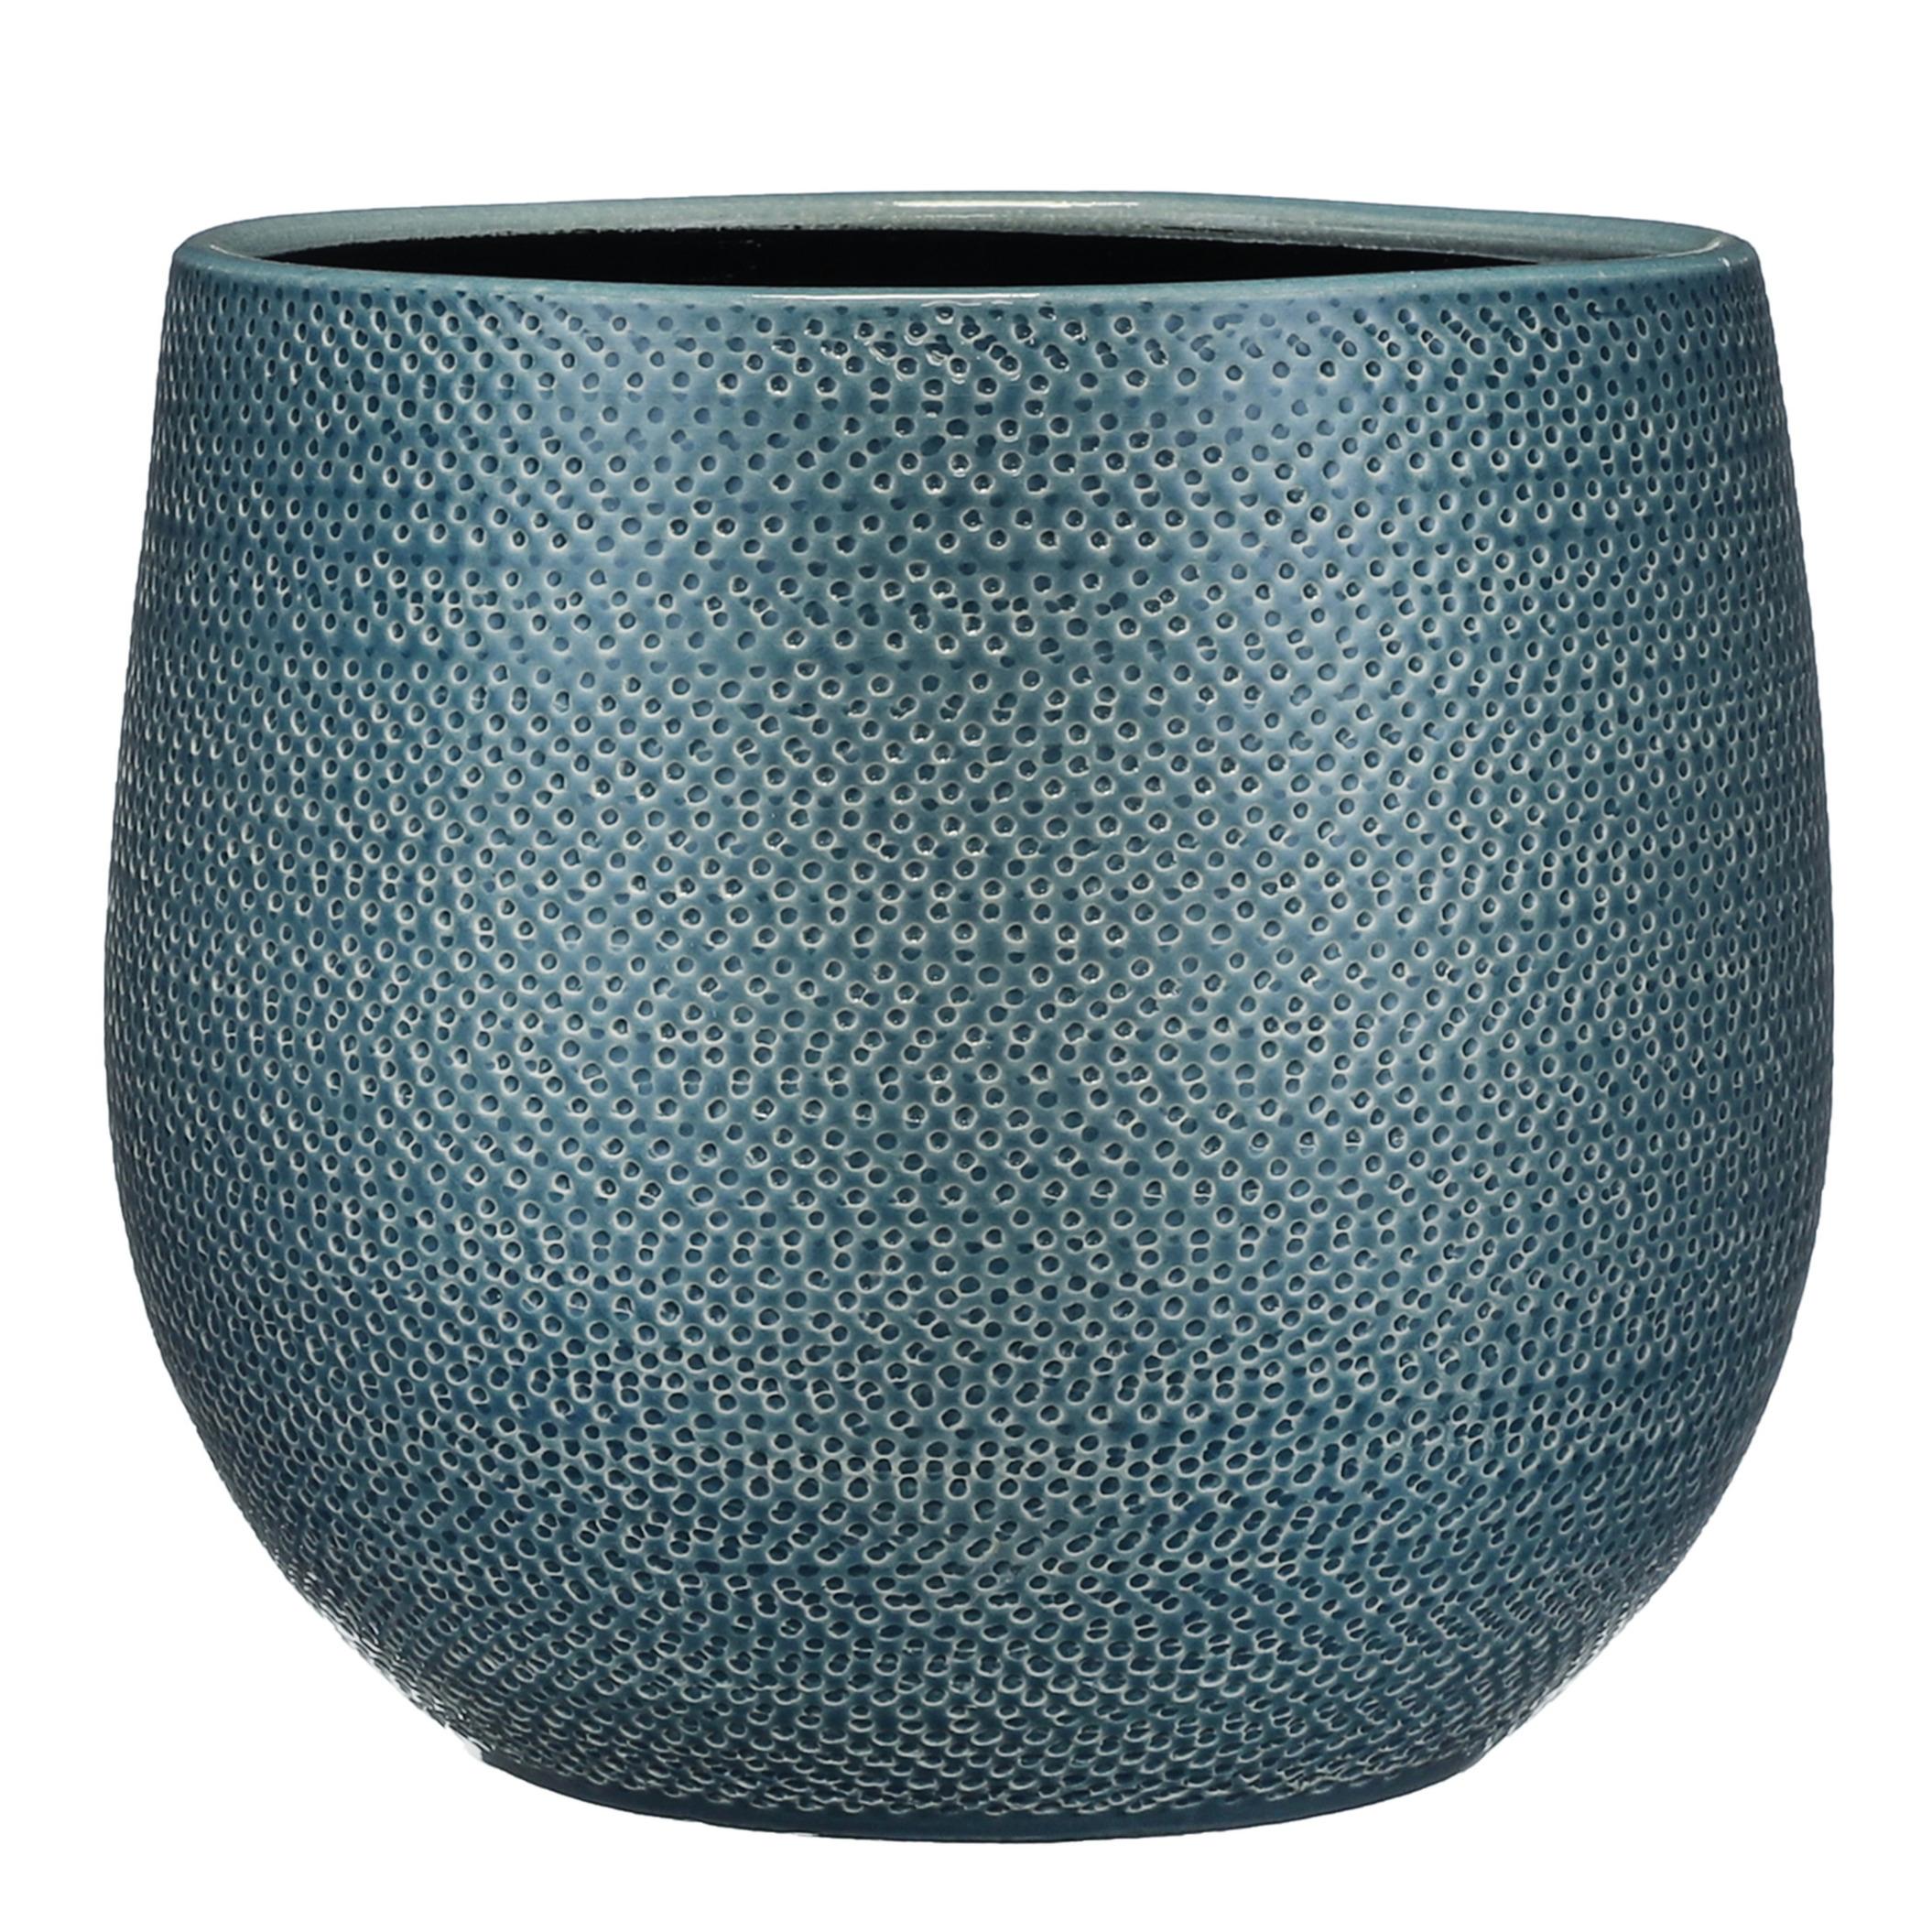 Bloempot midnight blauw ribbels keramiek voor kamerplant H25 x D29 cm -